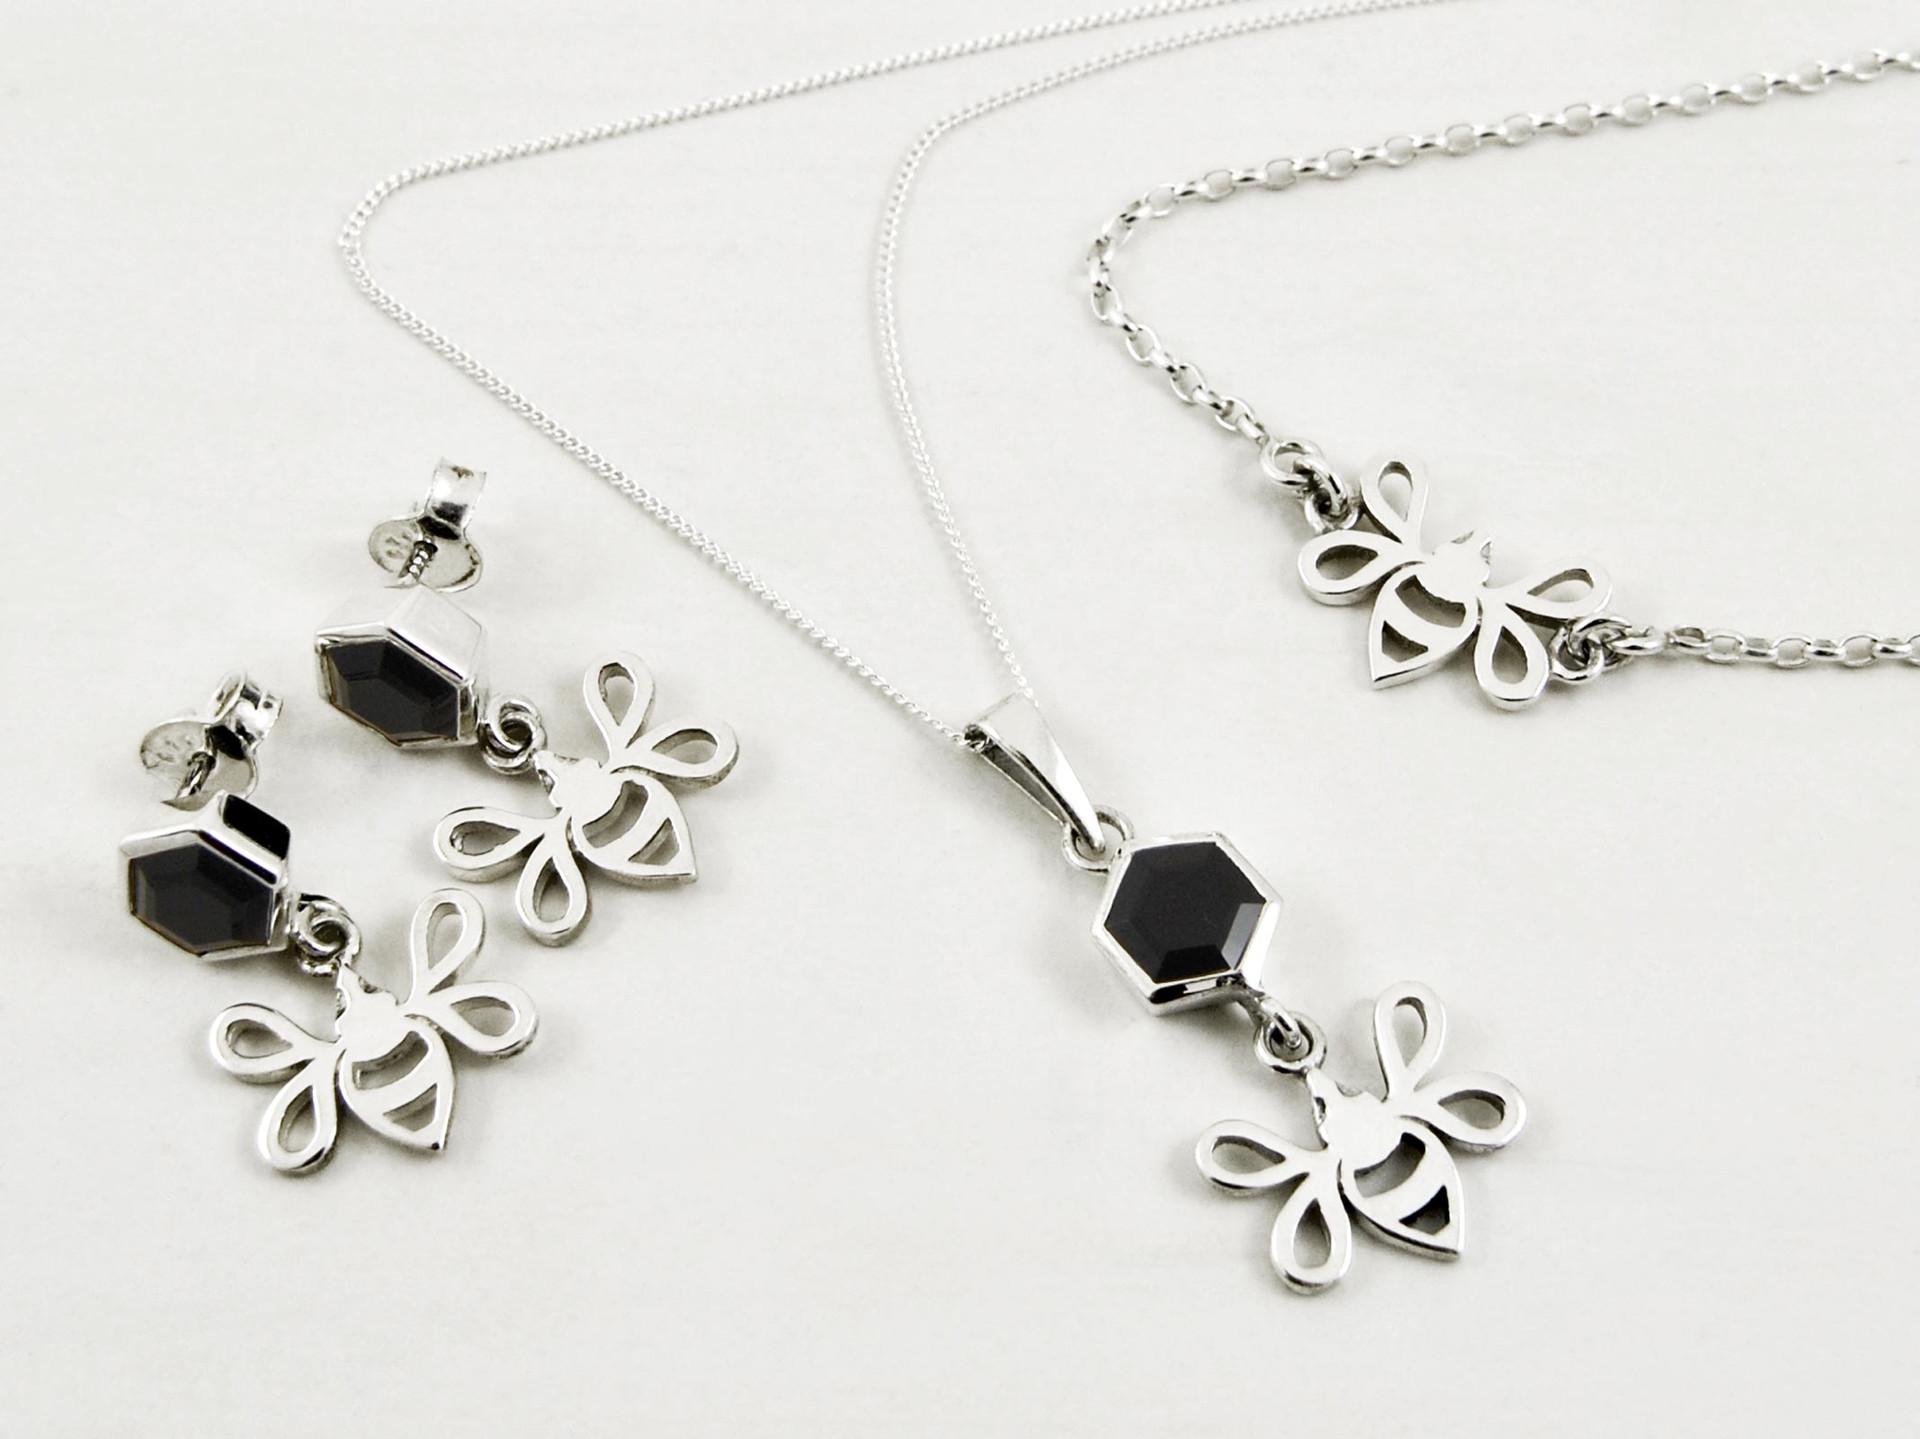 honeycomb-jewellery-set2-design-martin-m